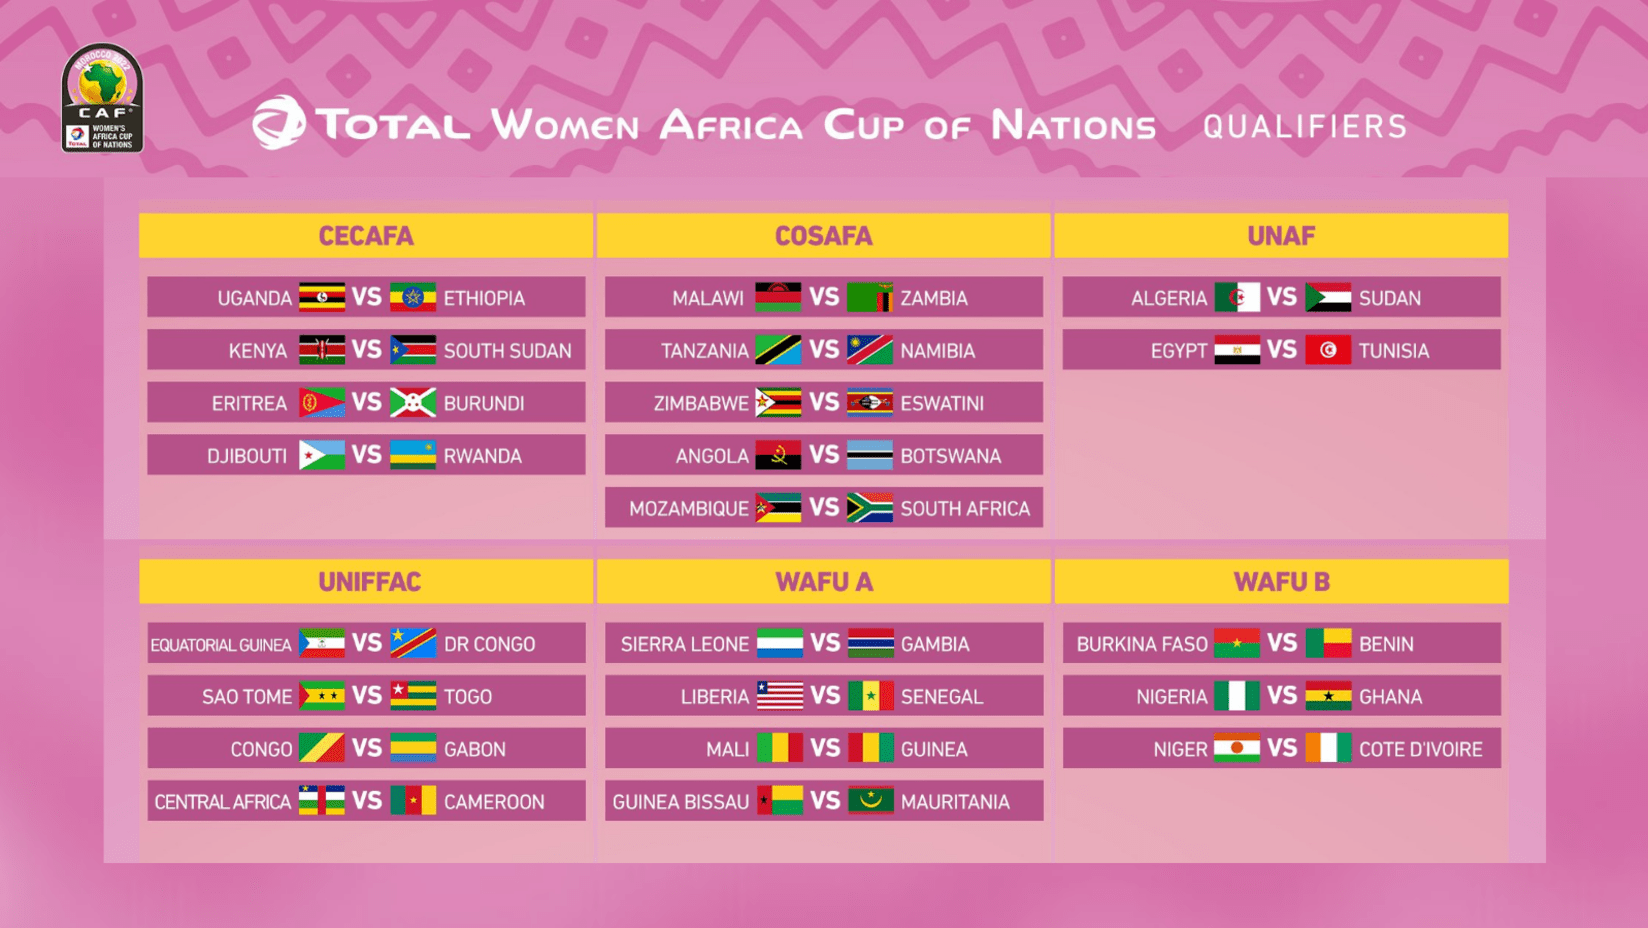 CAF announces Women's AFCON qualification process